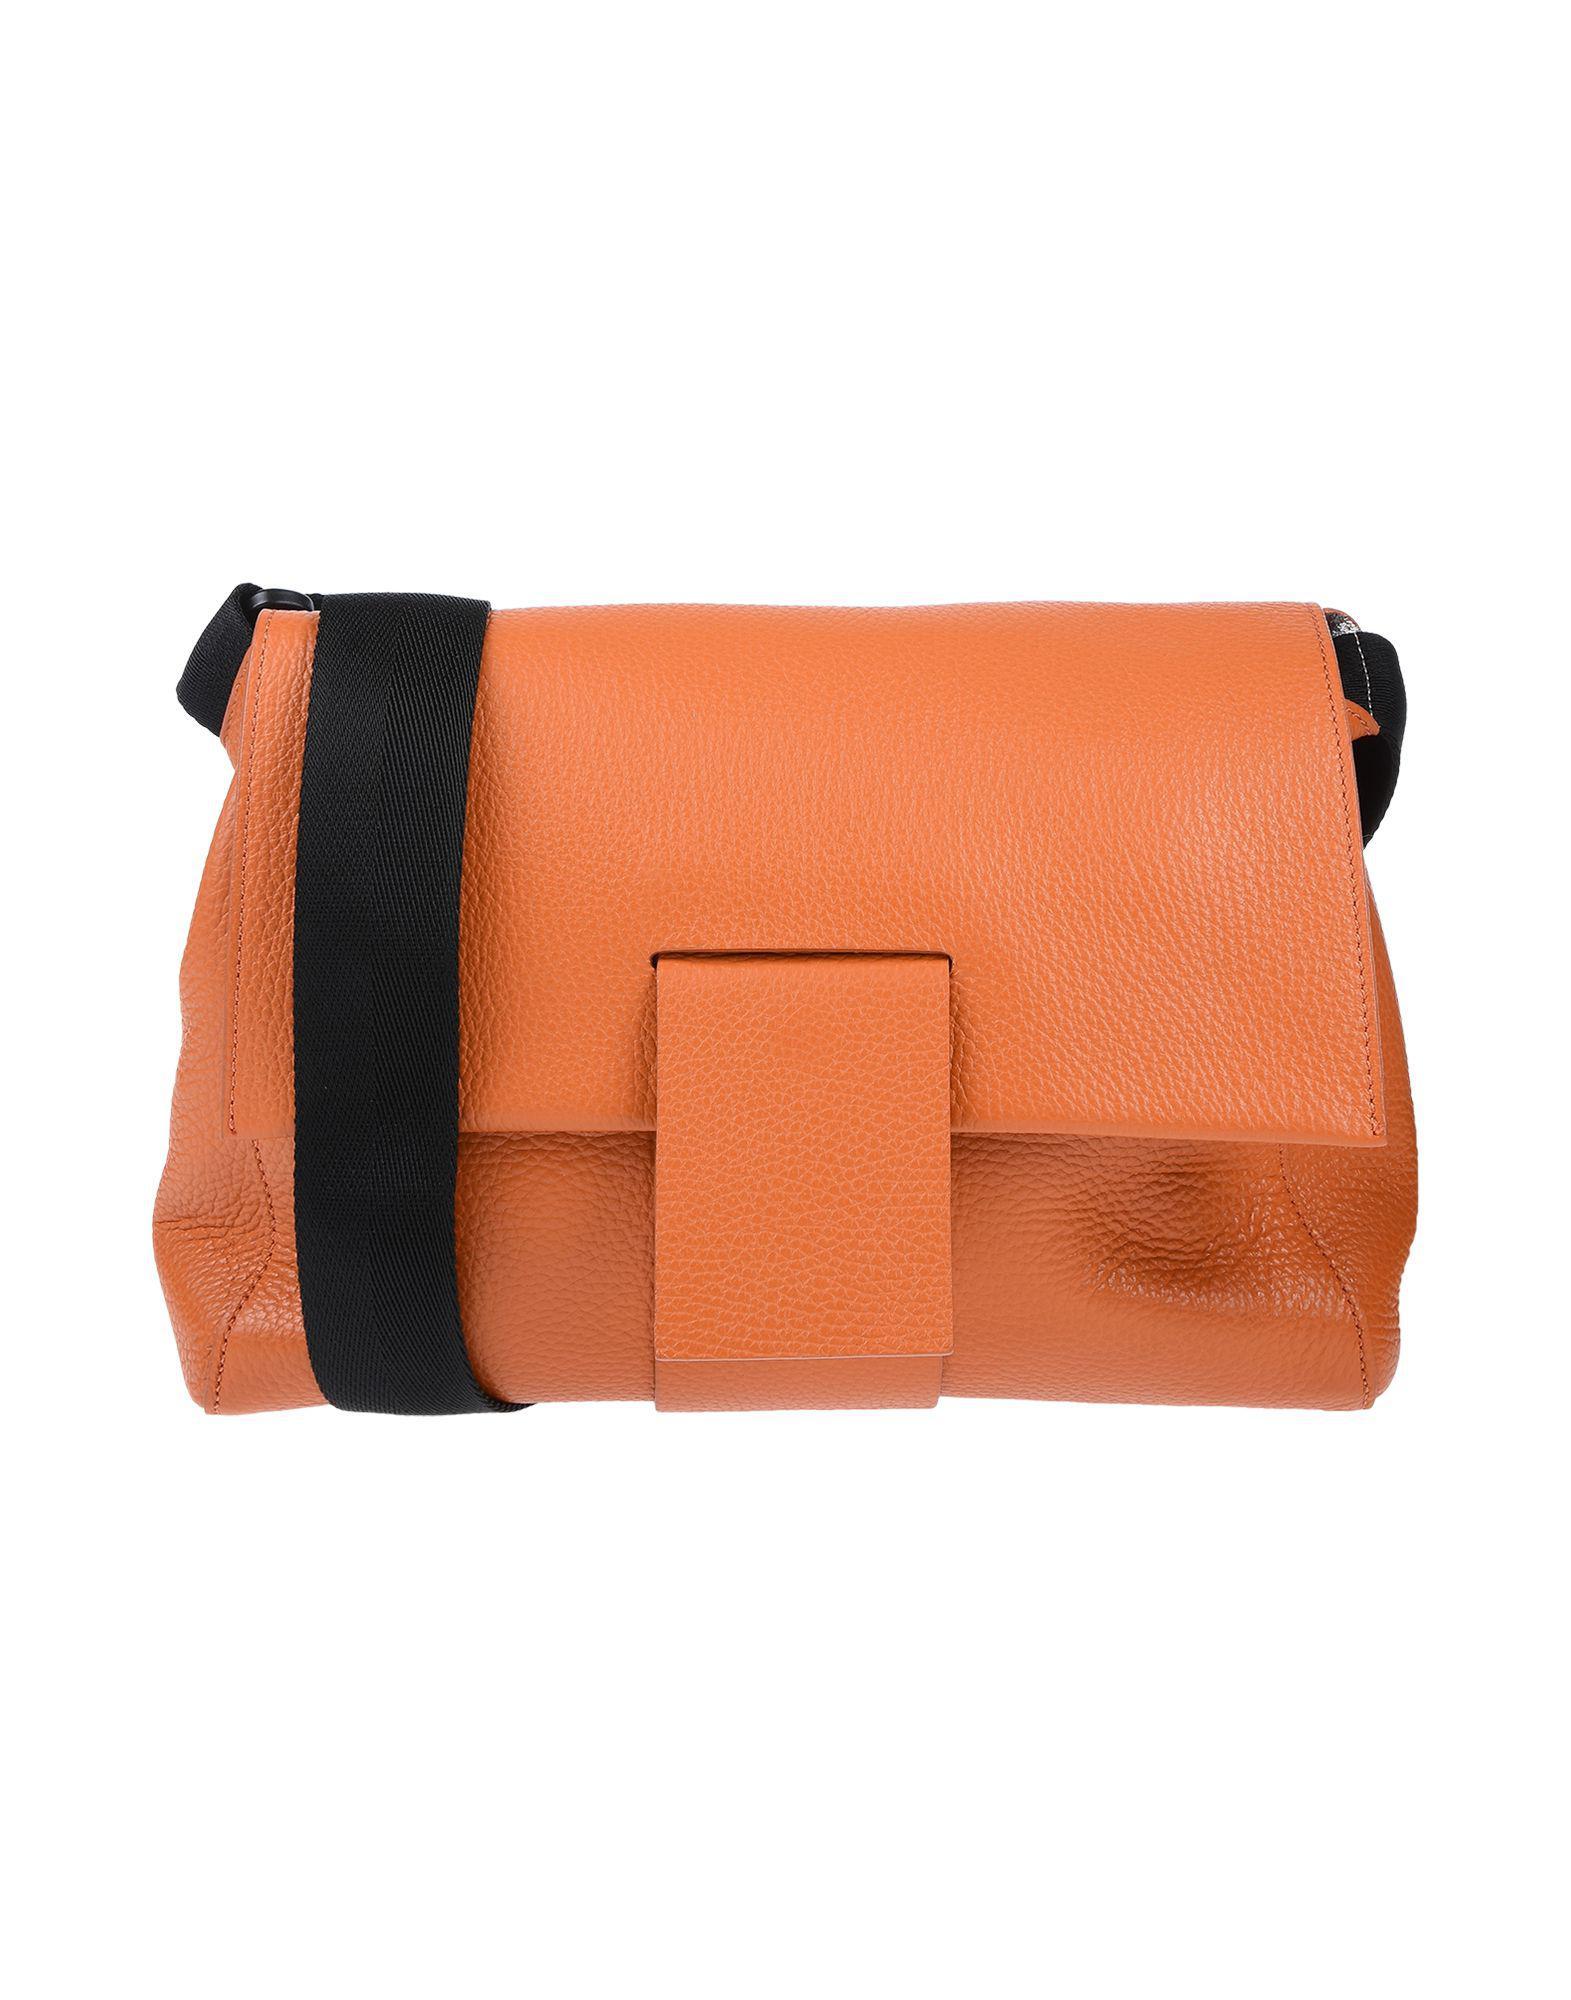 32aad066ea34 MM6 by Maison Martin Margiela - Orange Cross-body Bag - Lyst. View  fullscreen